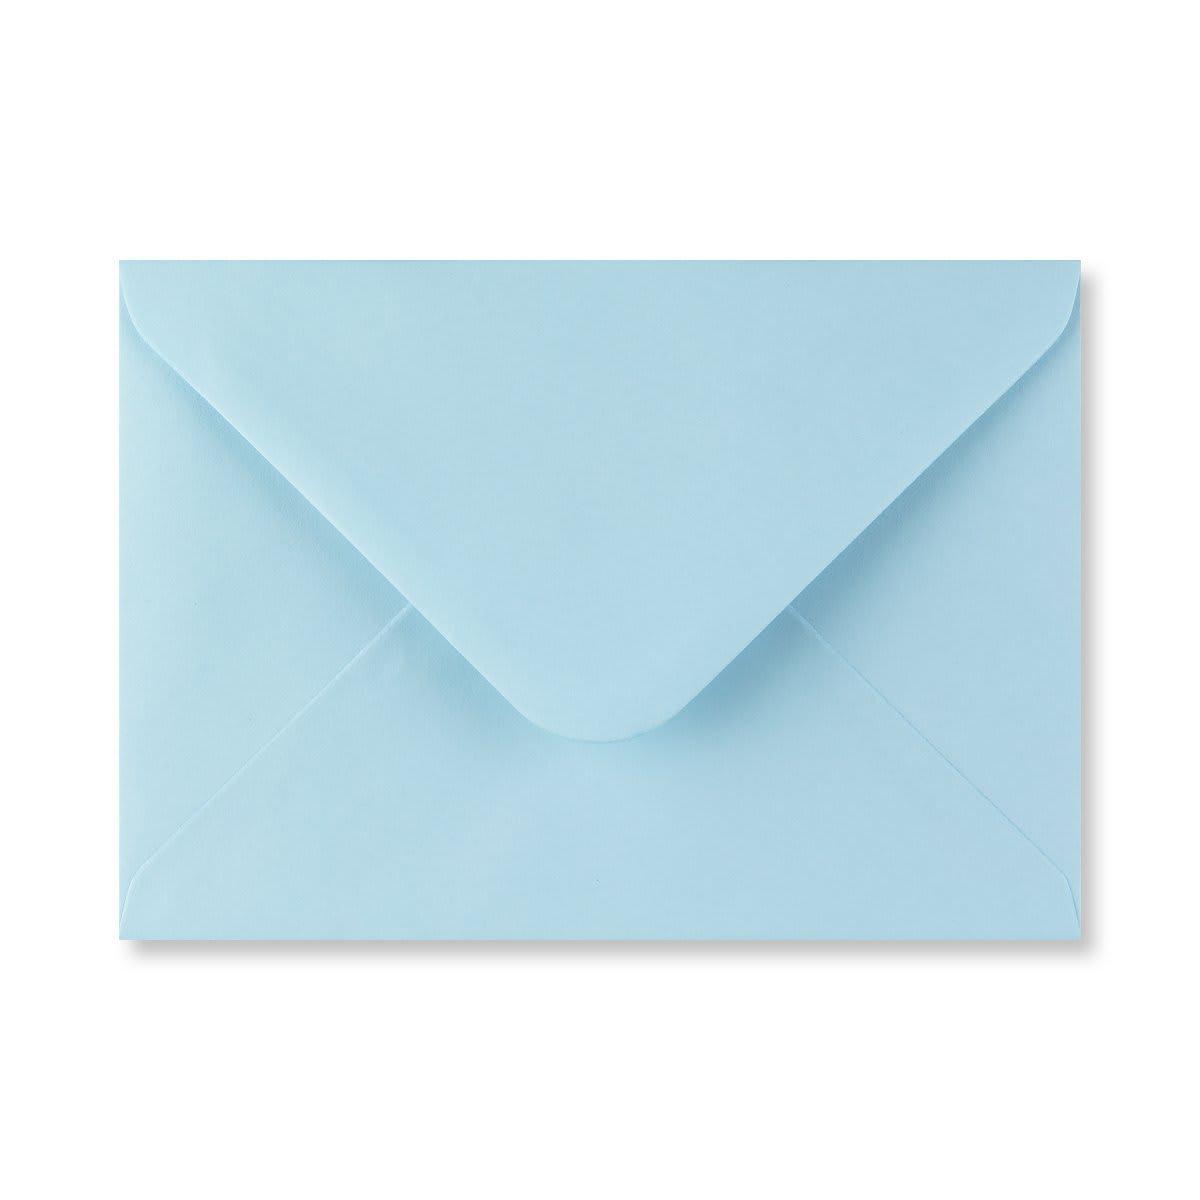 PASTEL BLUE 133 x 184 mm ENVELOPES (i8)